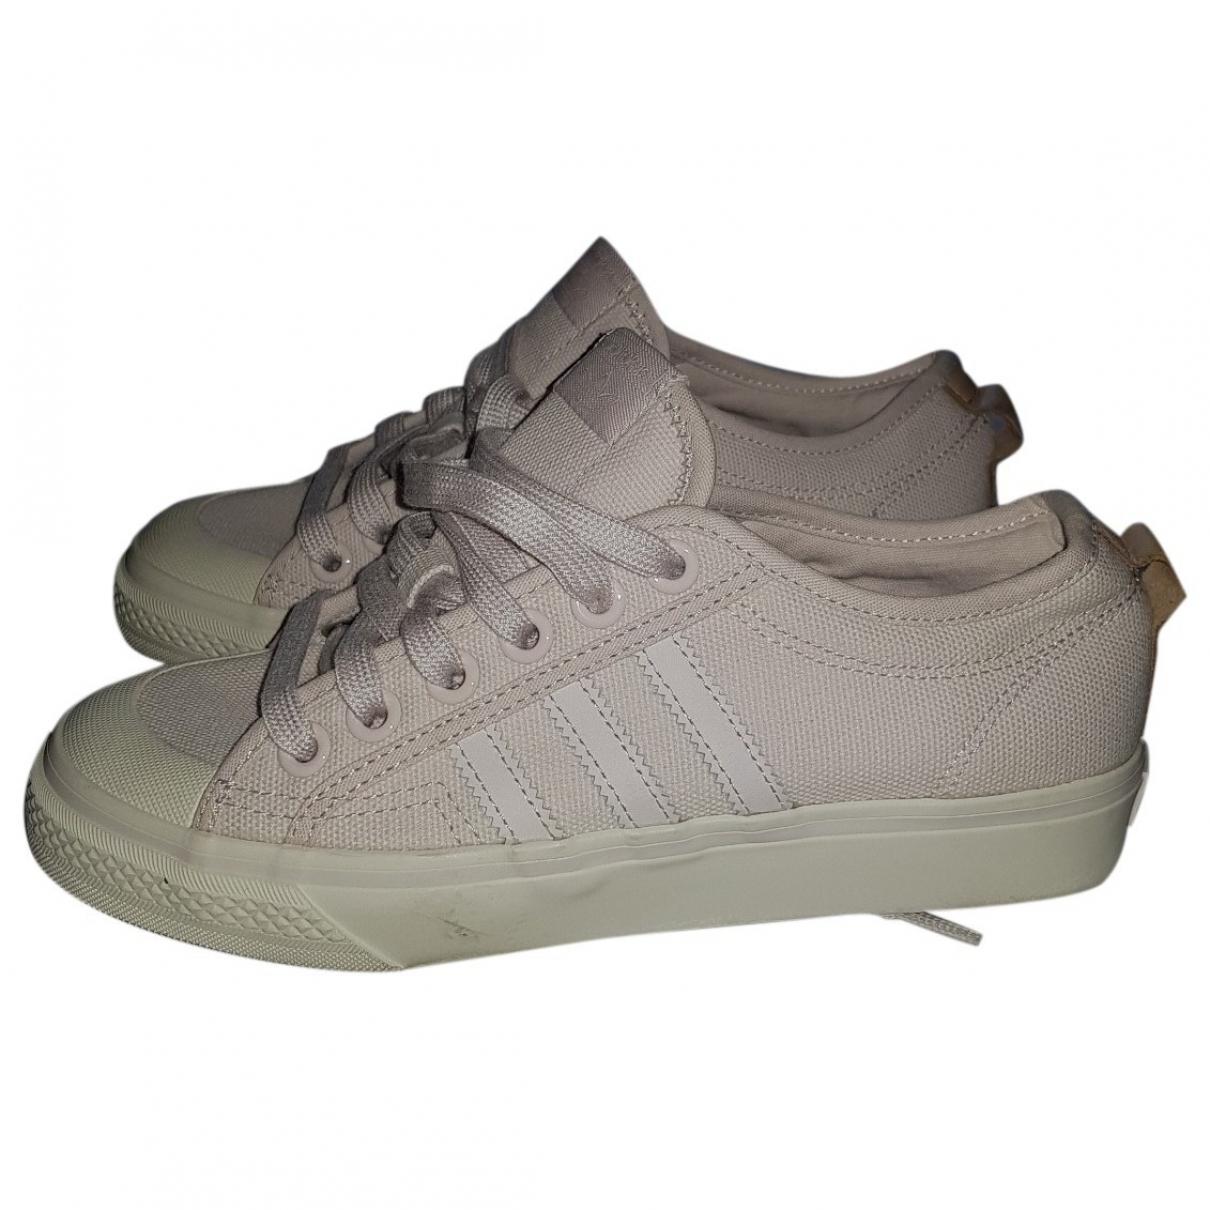 Adidas \N Beige Cloth Trainers for Women 37.5 EU